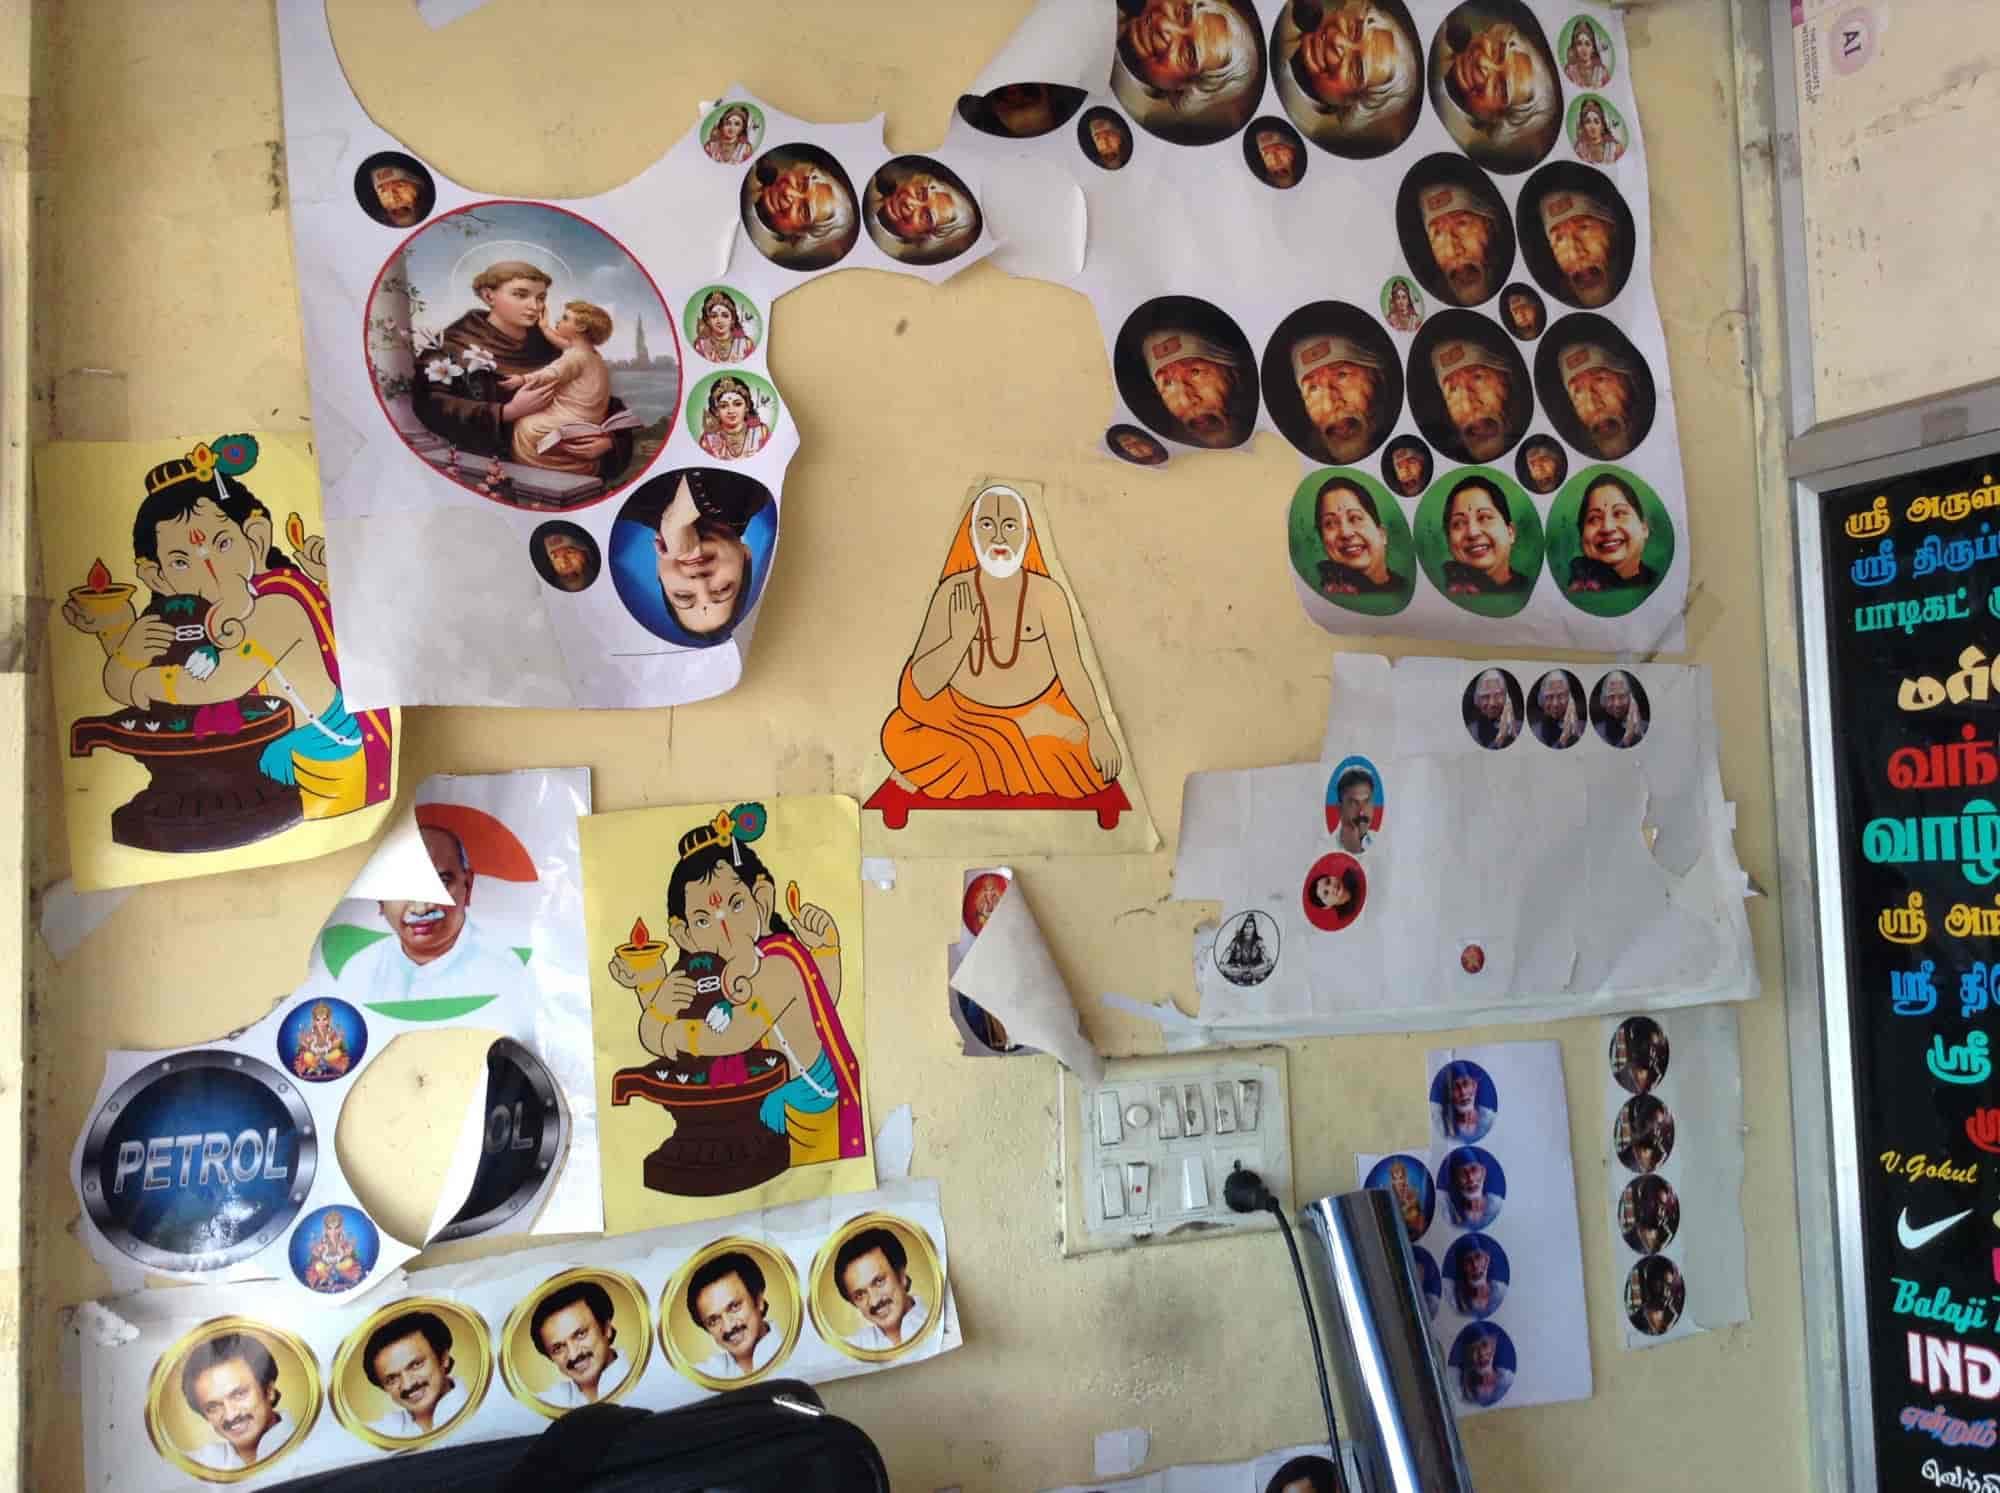 Radium stickers gk sticker shop photos vadapalani chennai sticker dealers